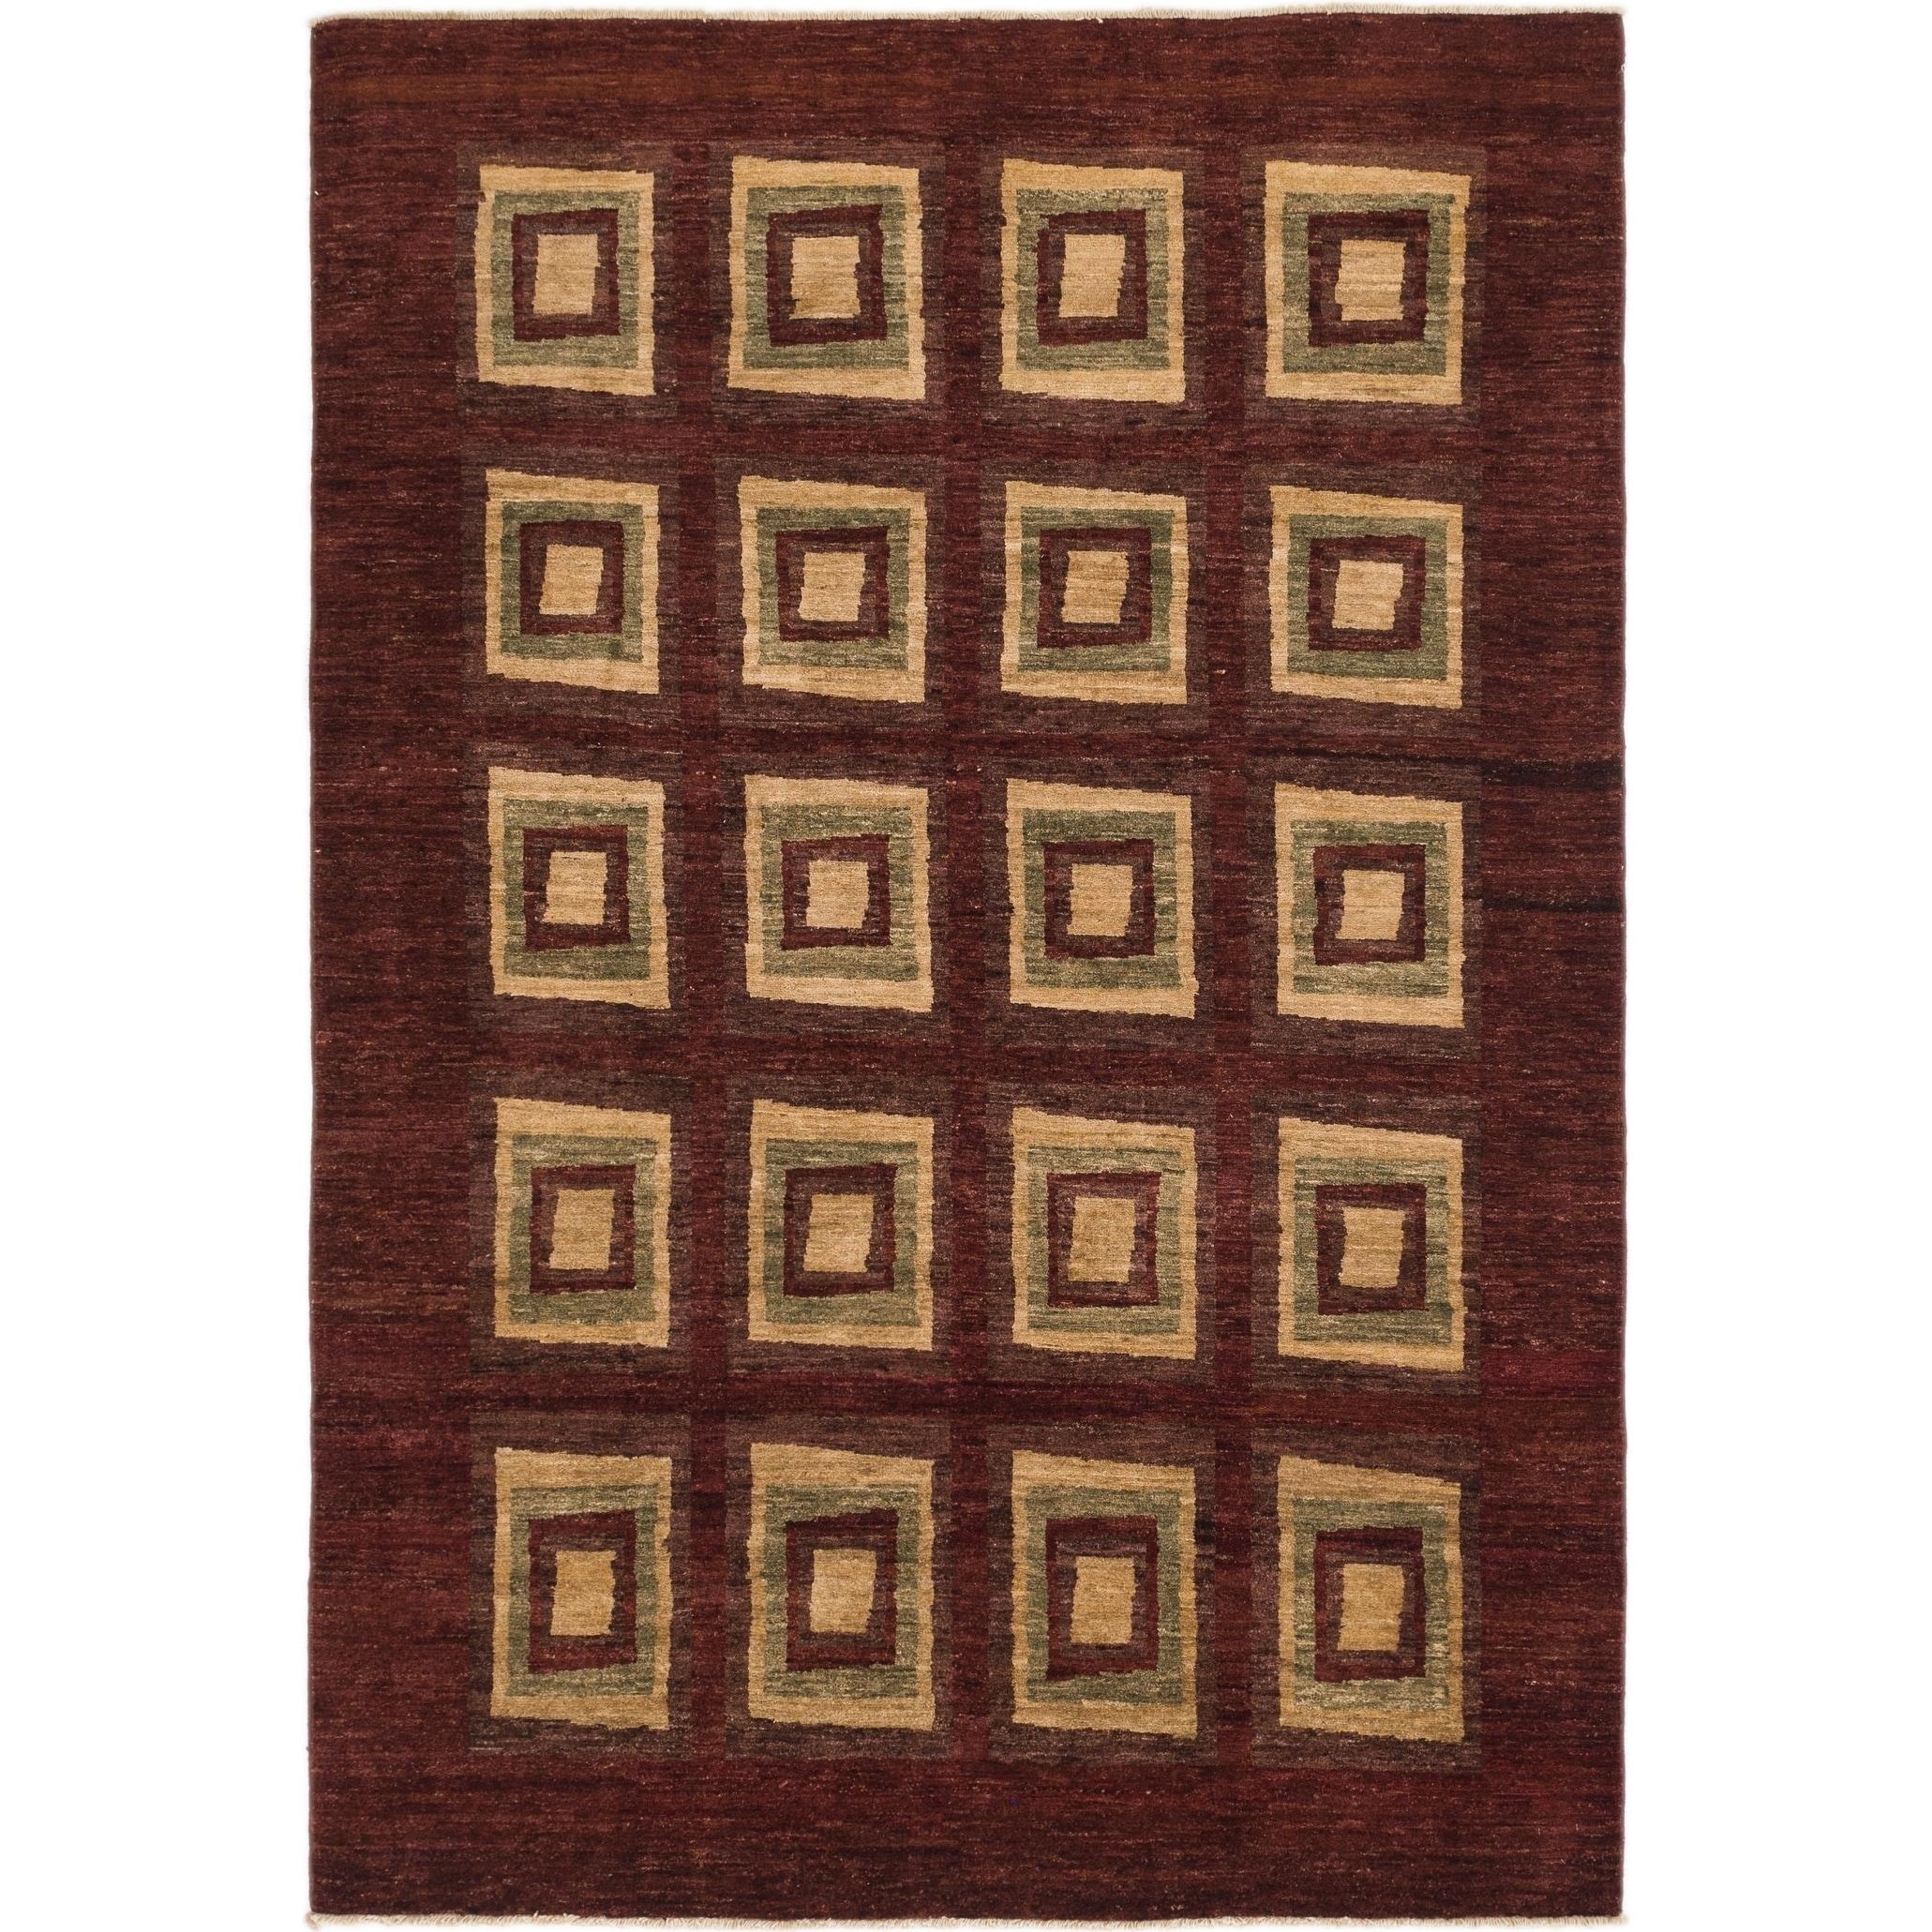 Hand Knotted Kashkuli Gabbeh Wool Area Rug - 6 2 x 9 (Burgundy - 6 2 x 9)